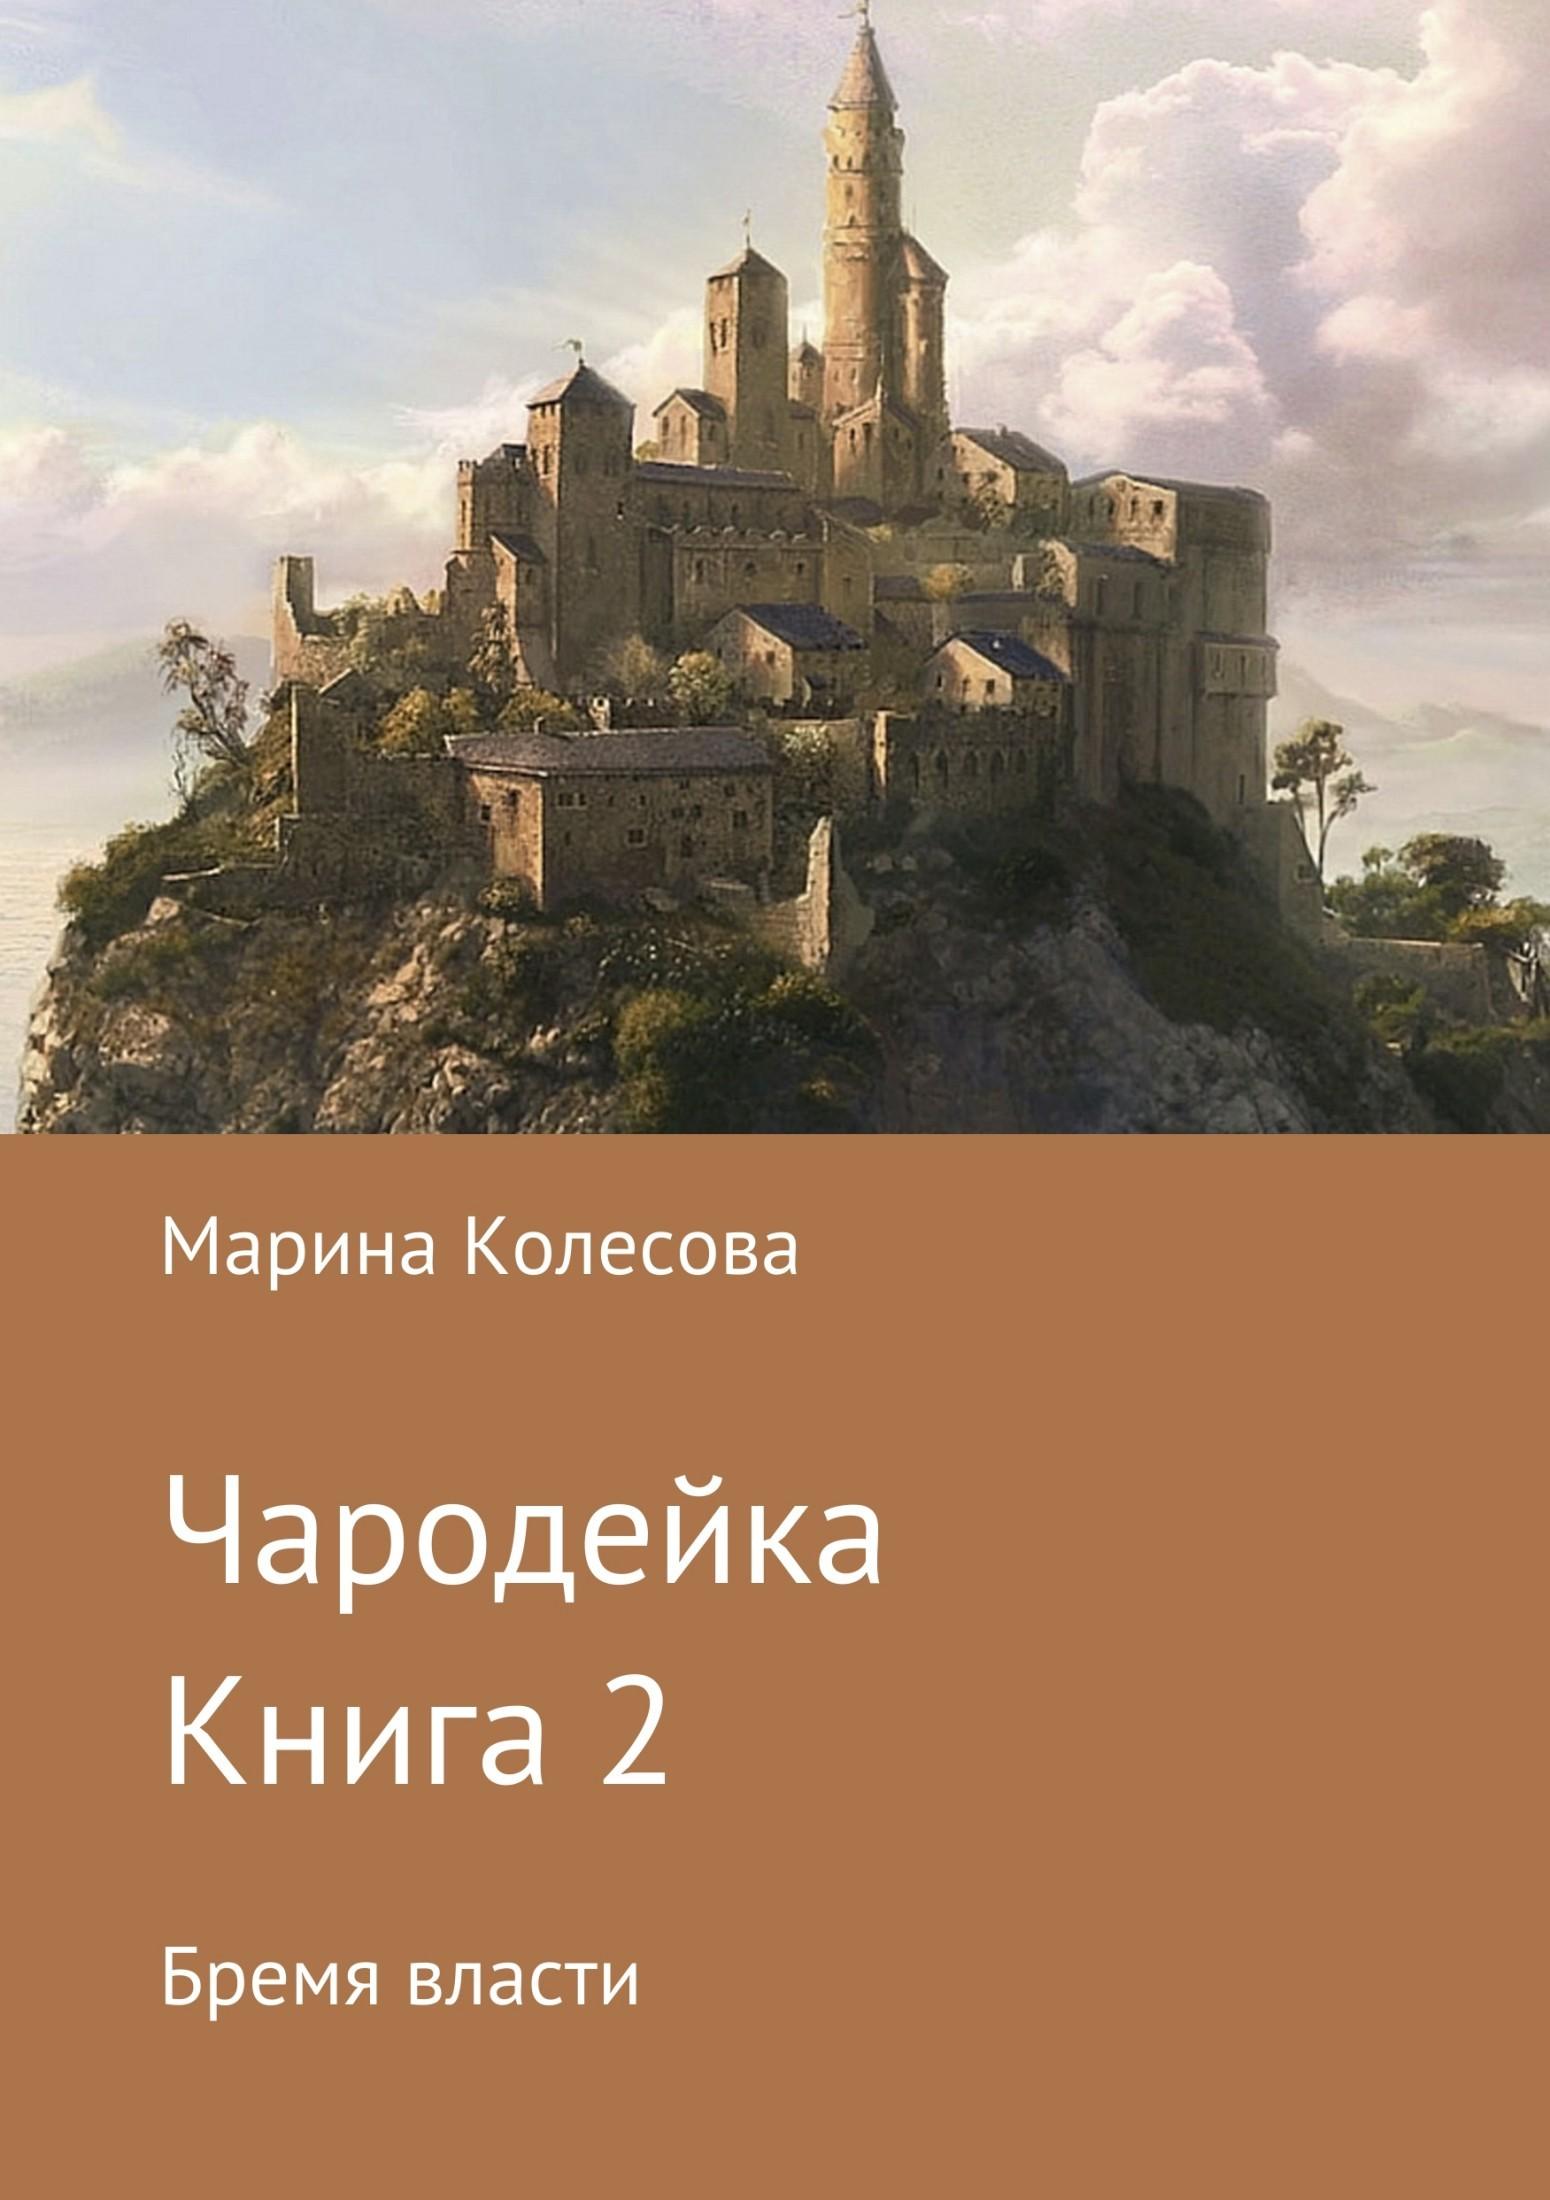 Чародейка. Книга 2. Бремя власти